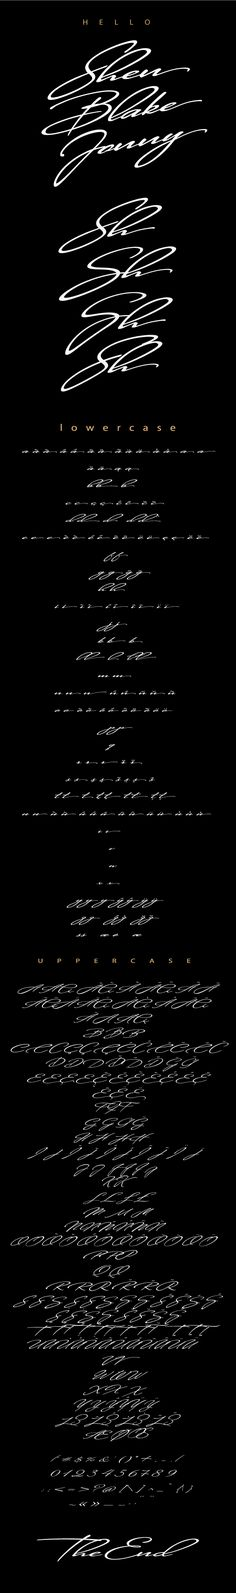 Shen - #Fonts